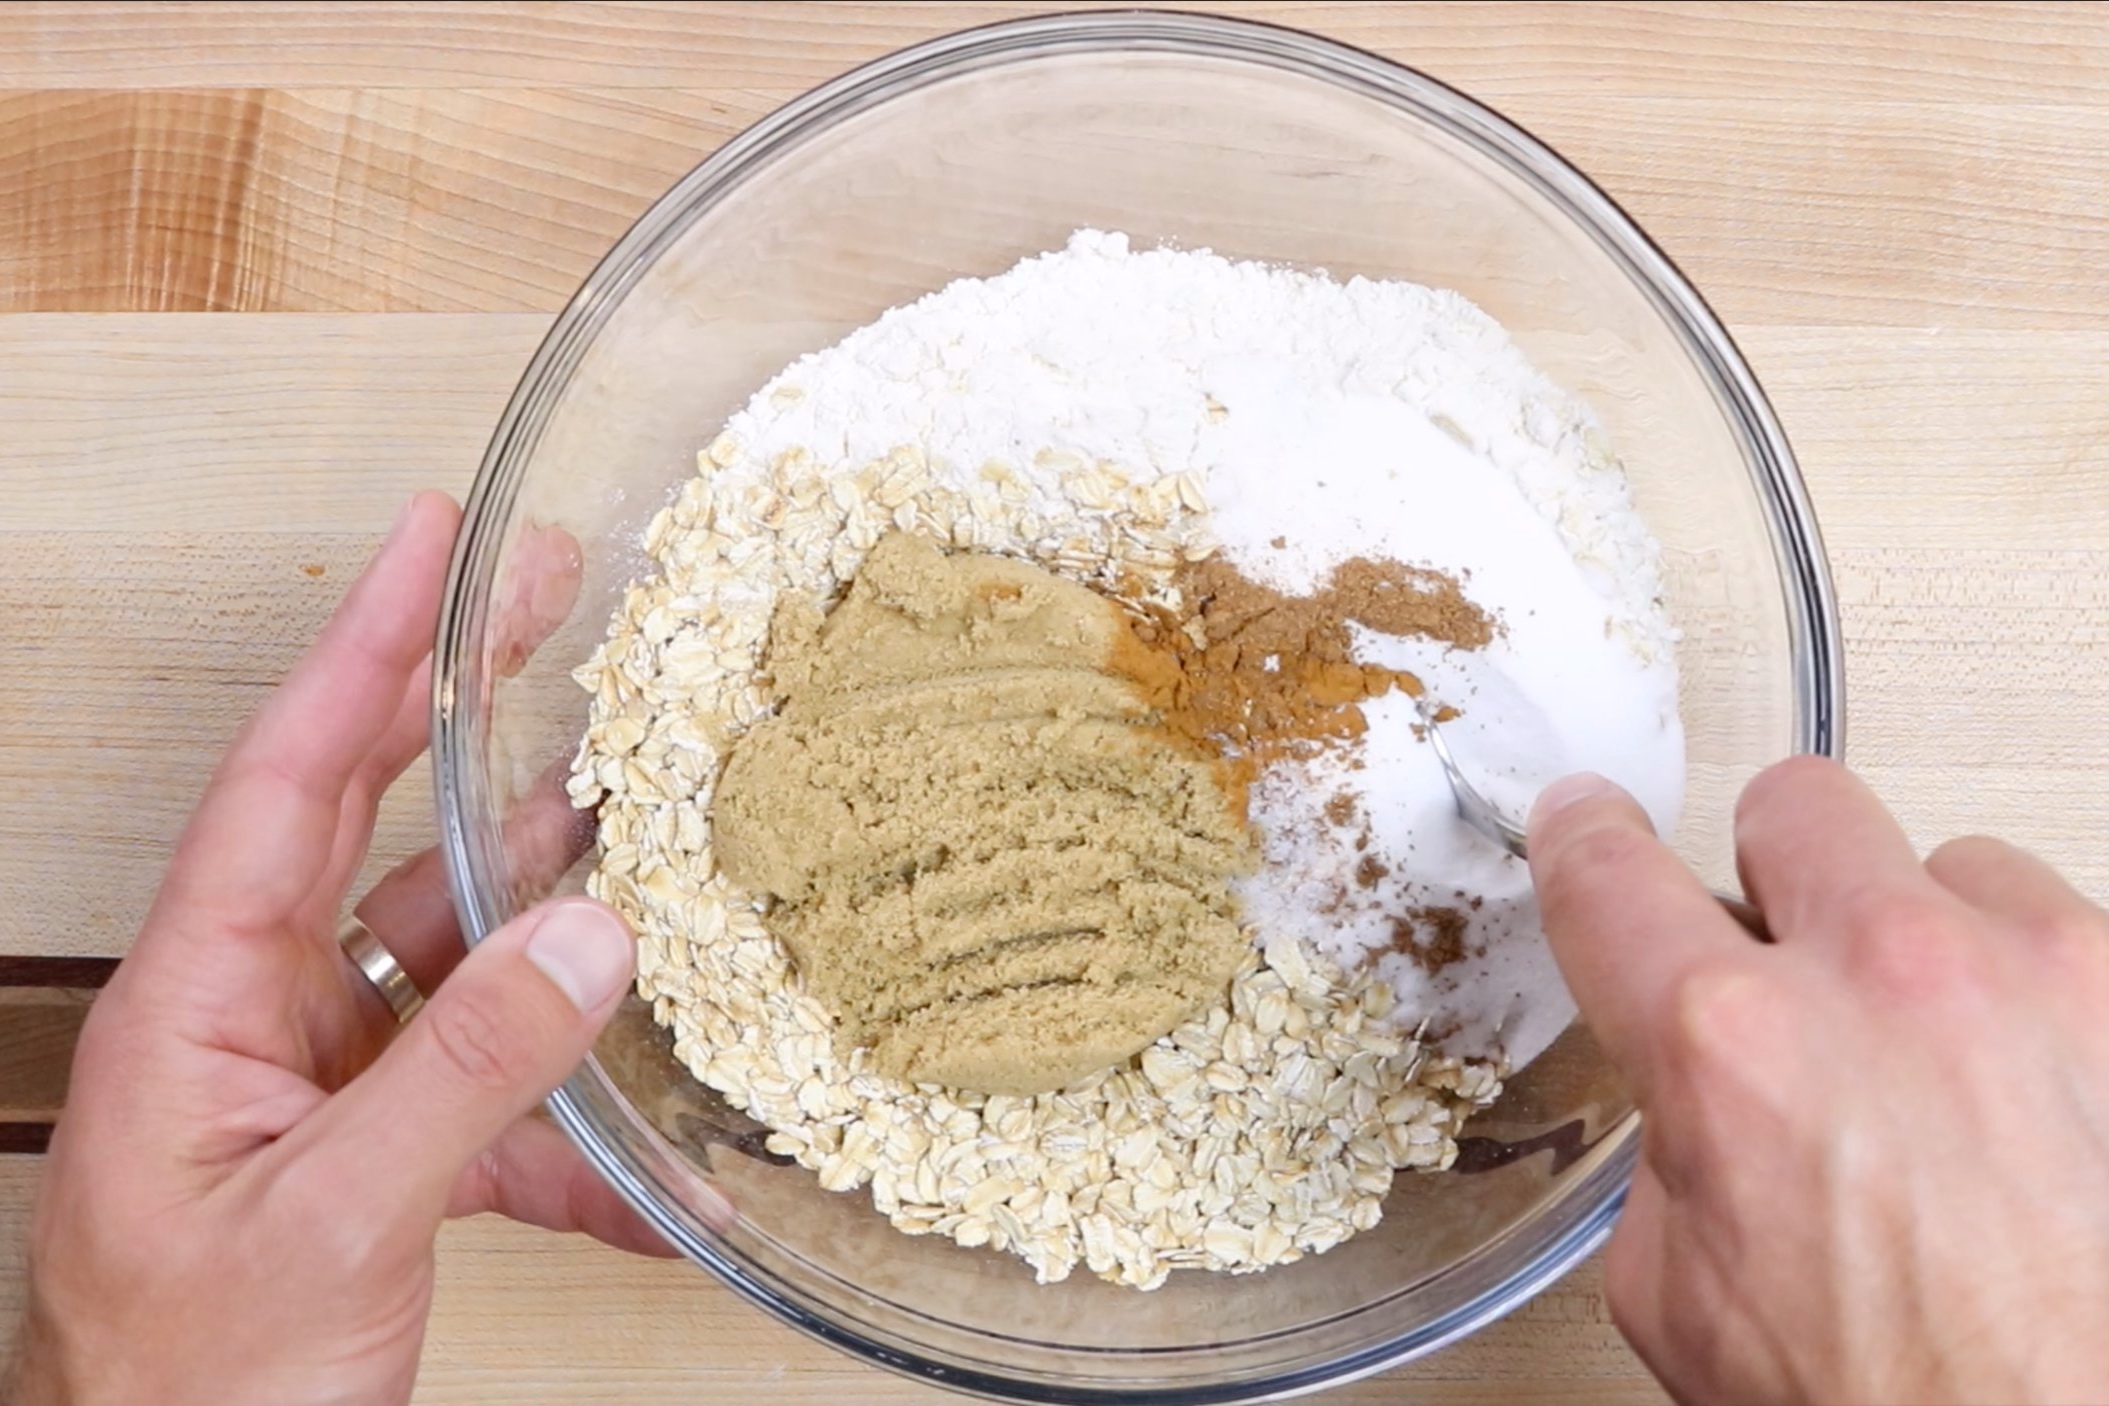 2. In a large bowl stir together the flour, oats, sugar, brown sugar, cinnamon, nutmeg and salt. -